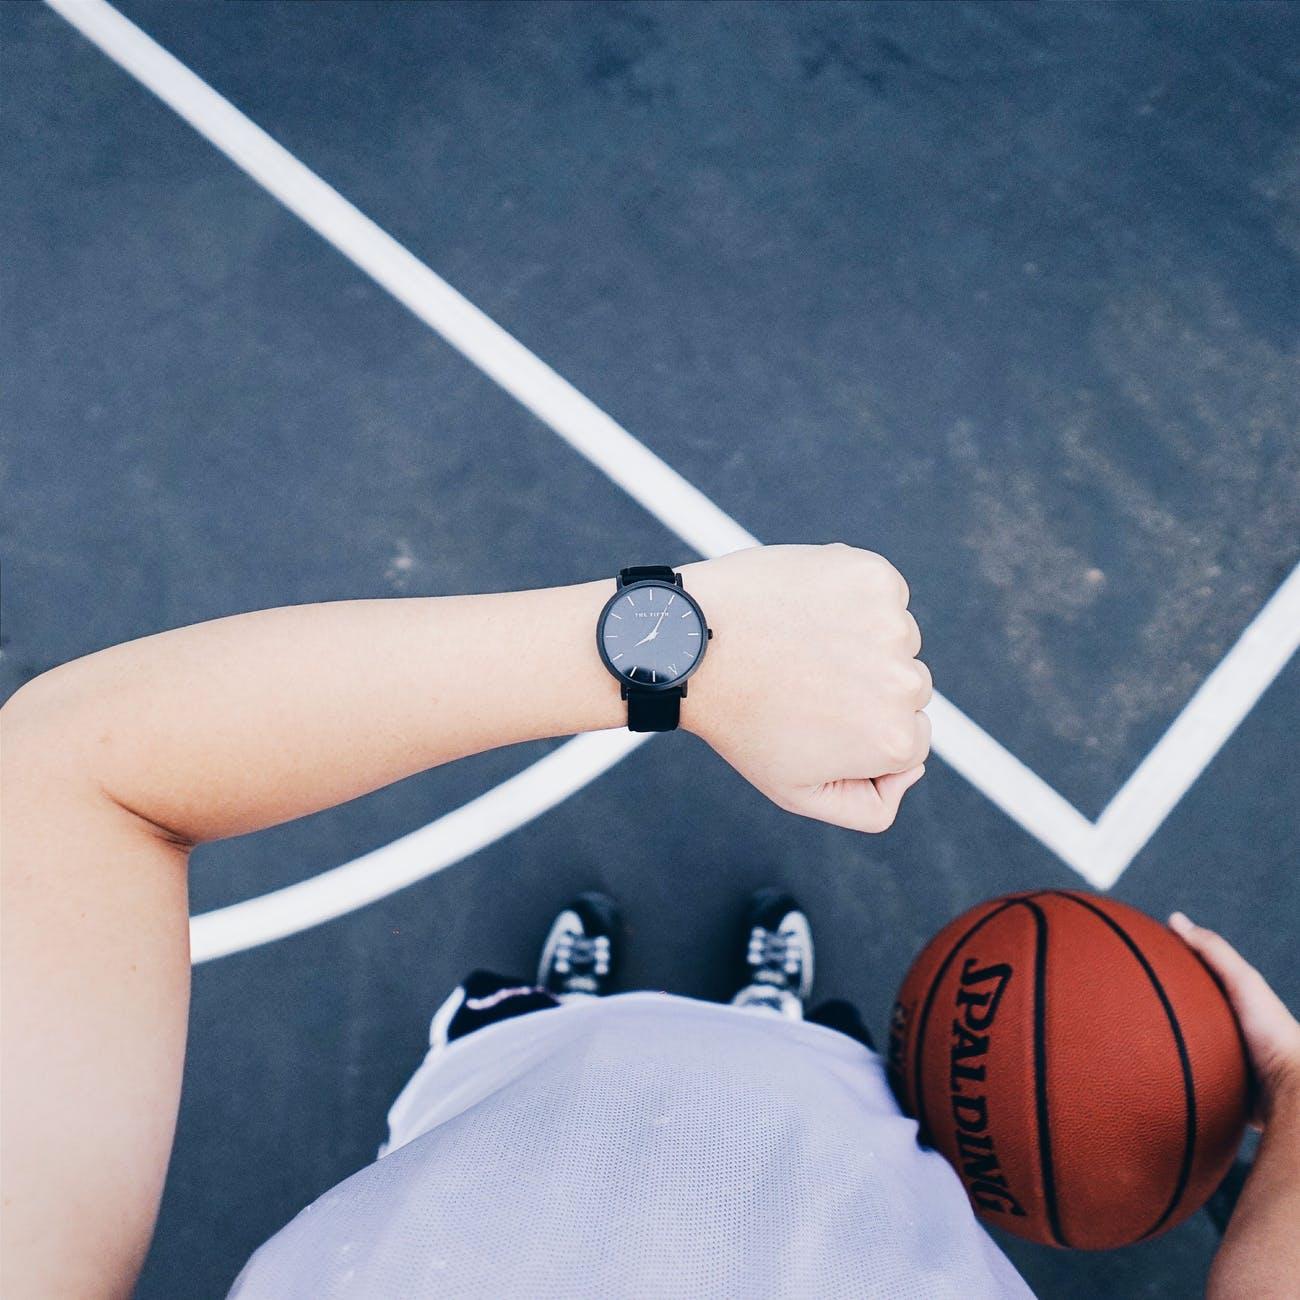 sportsmand med ur og basketball